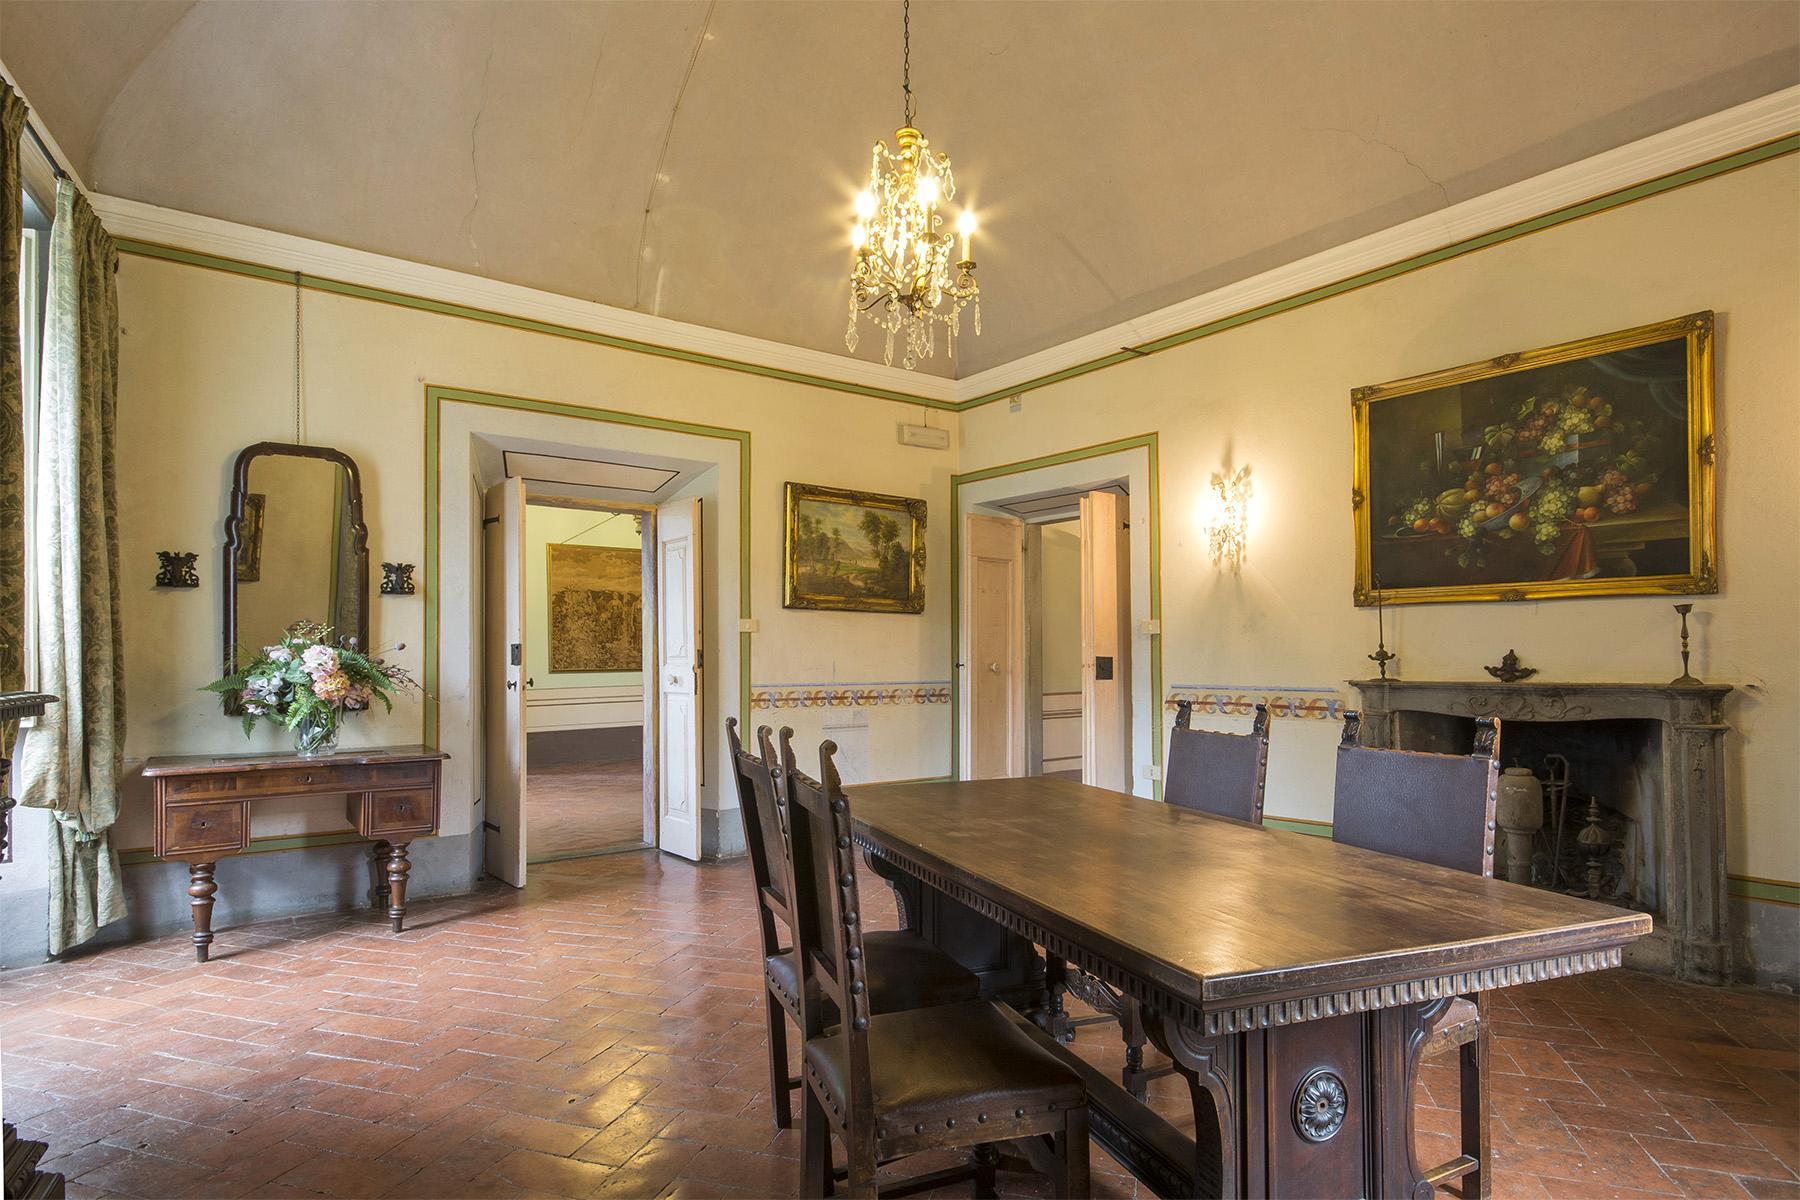 Wonderful Medicean Villa on the Pisan hills - 7